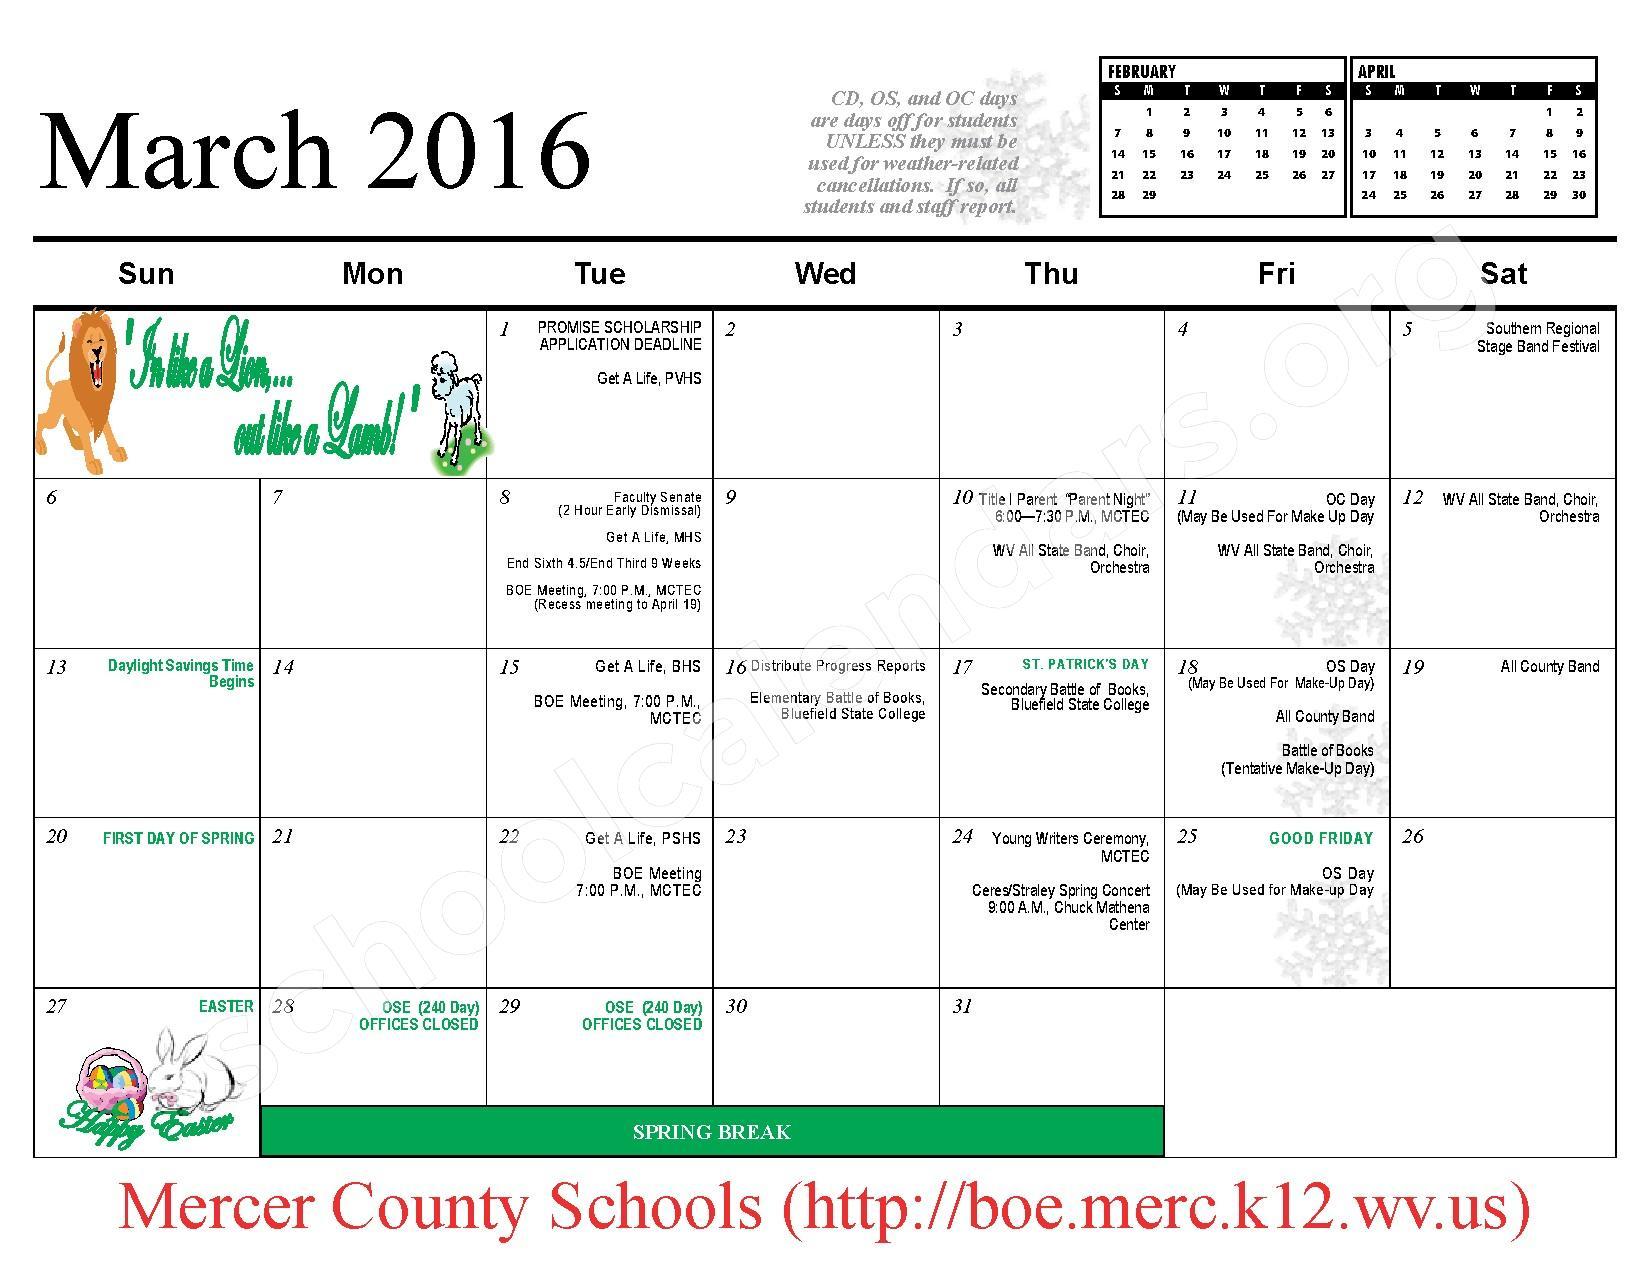 2015 - 2016 School Calendar – Mercer County Schools – page 10